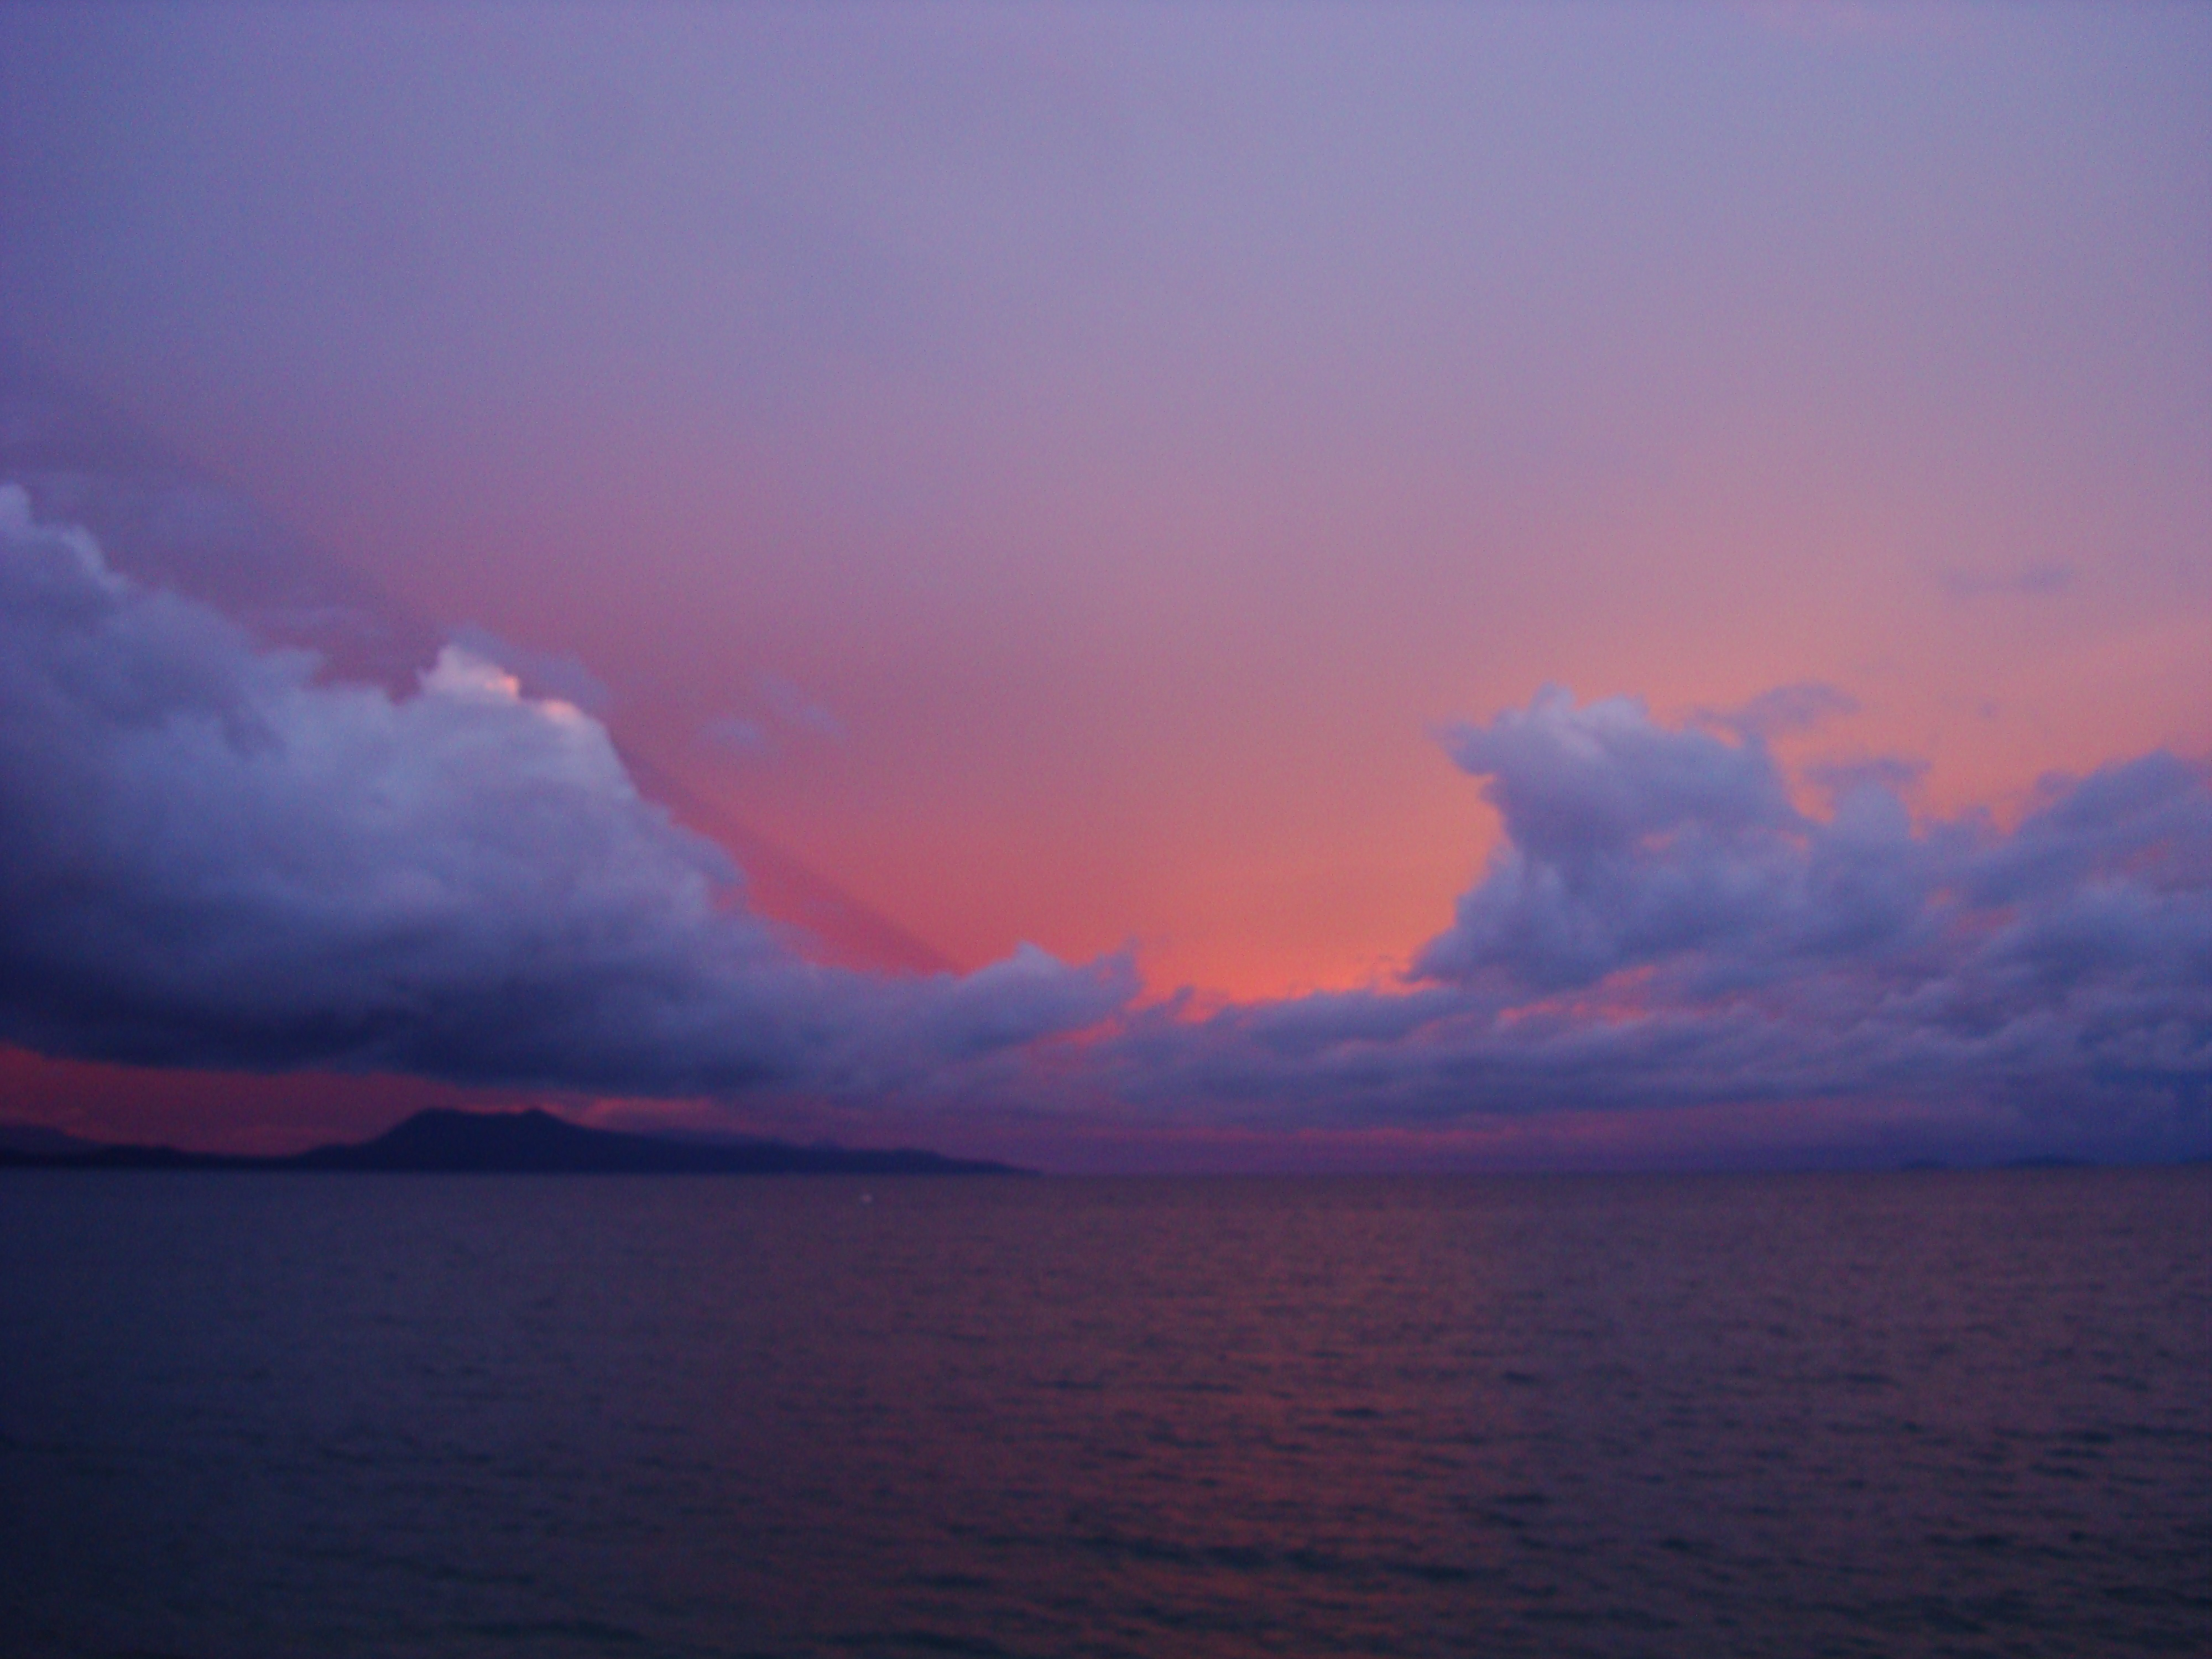 Sunrise Philippines Mindoro Island Tabinay 28